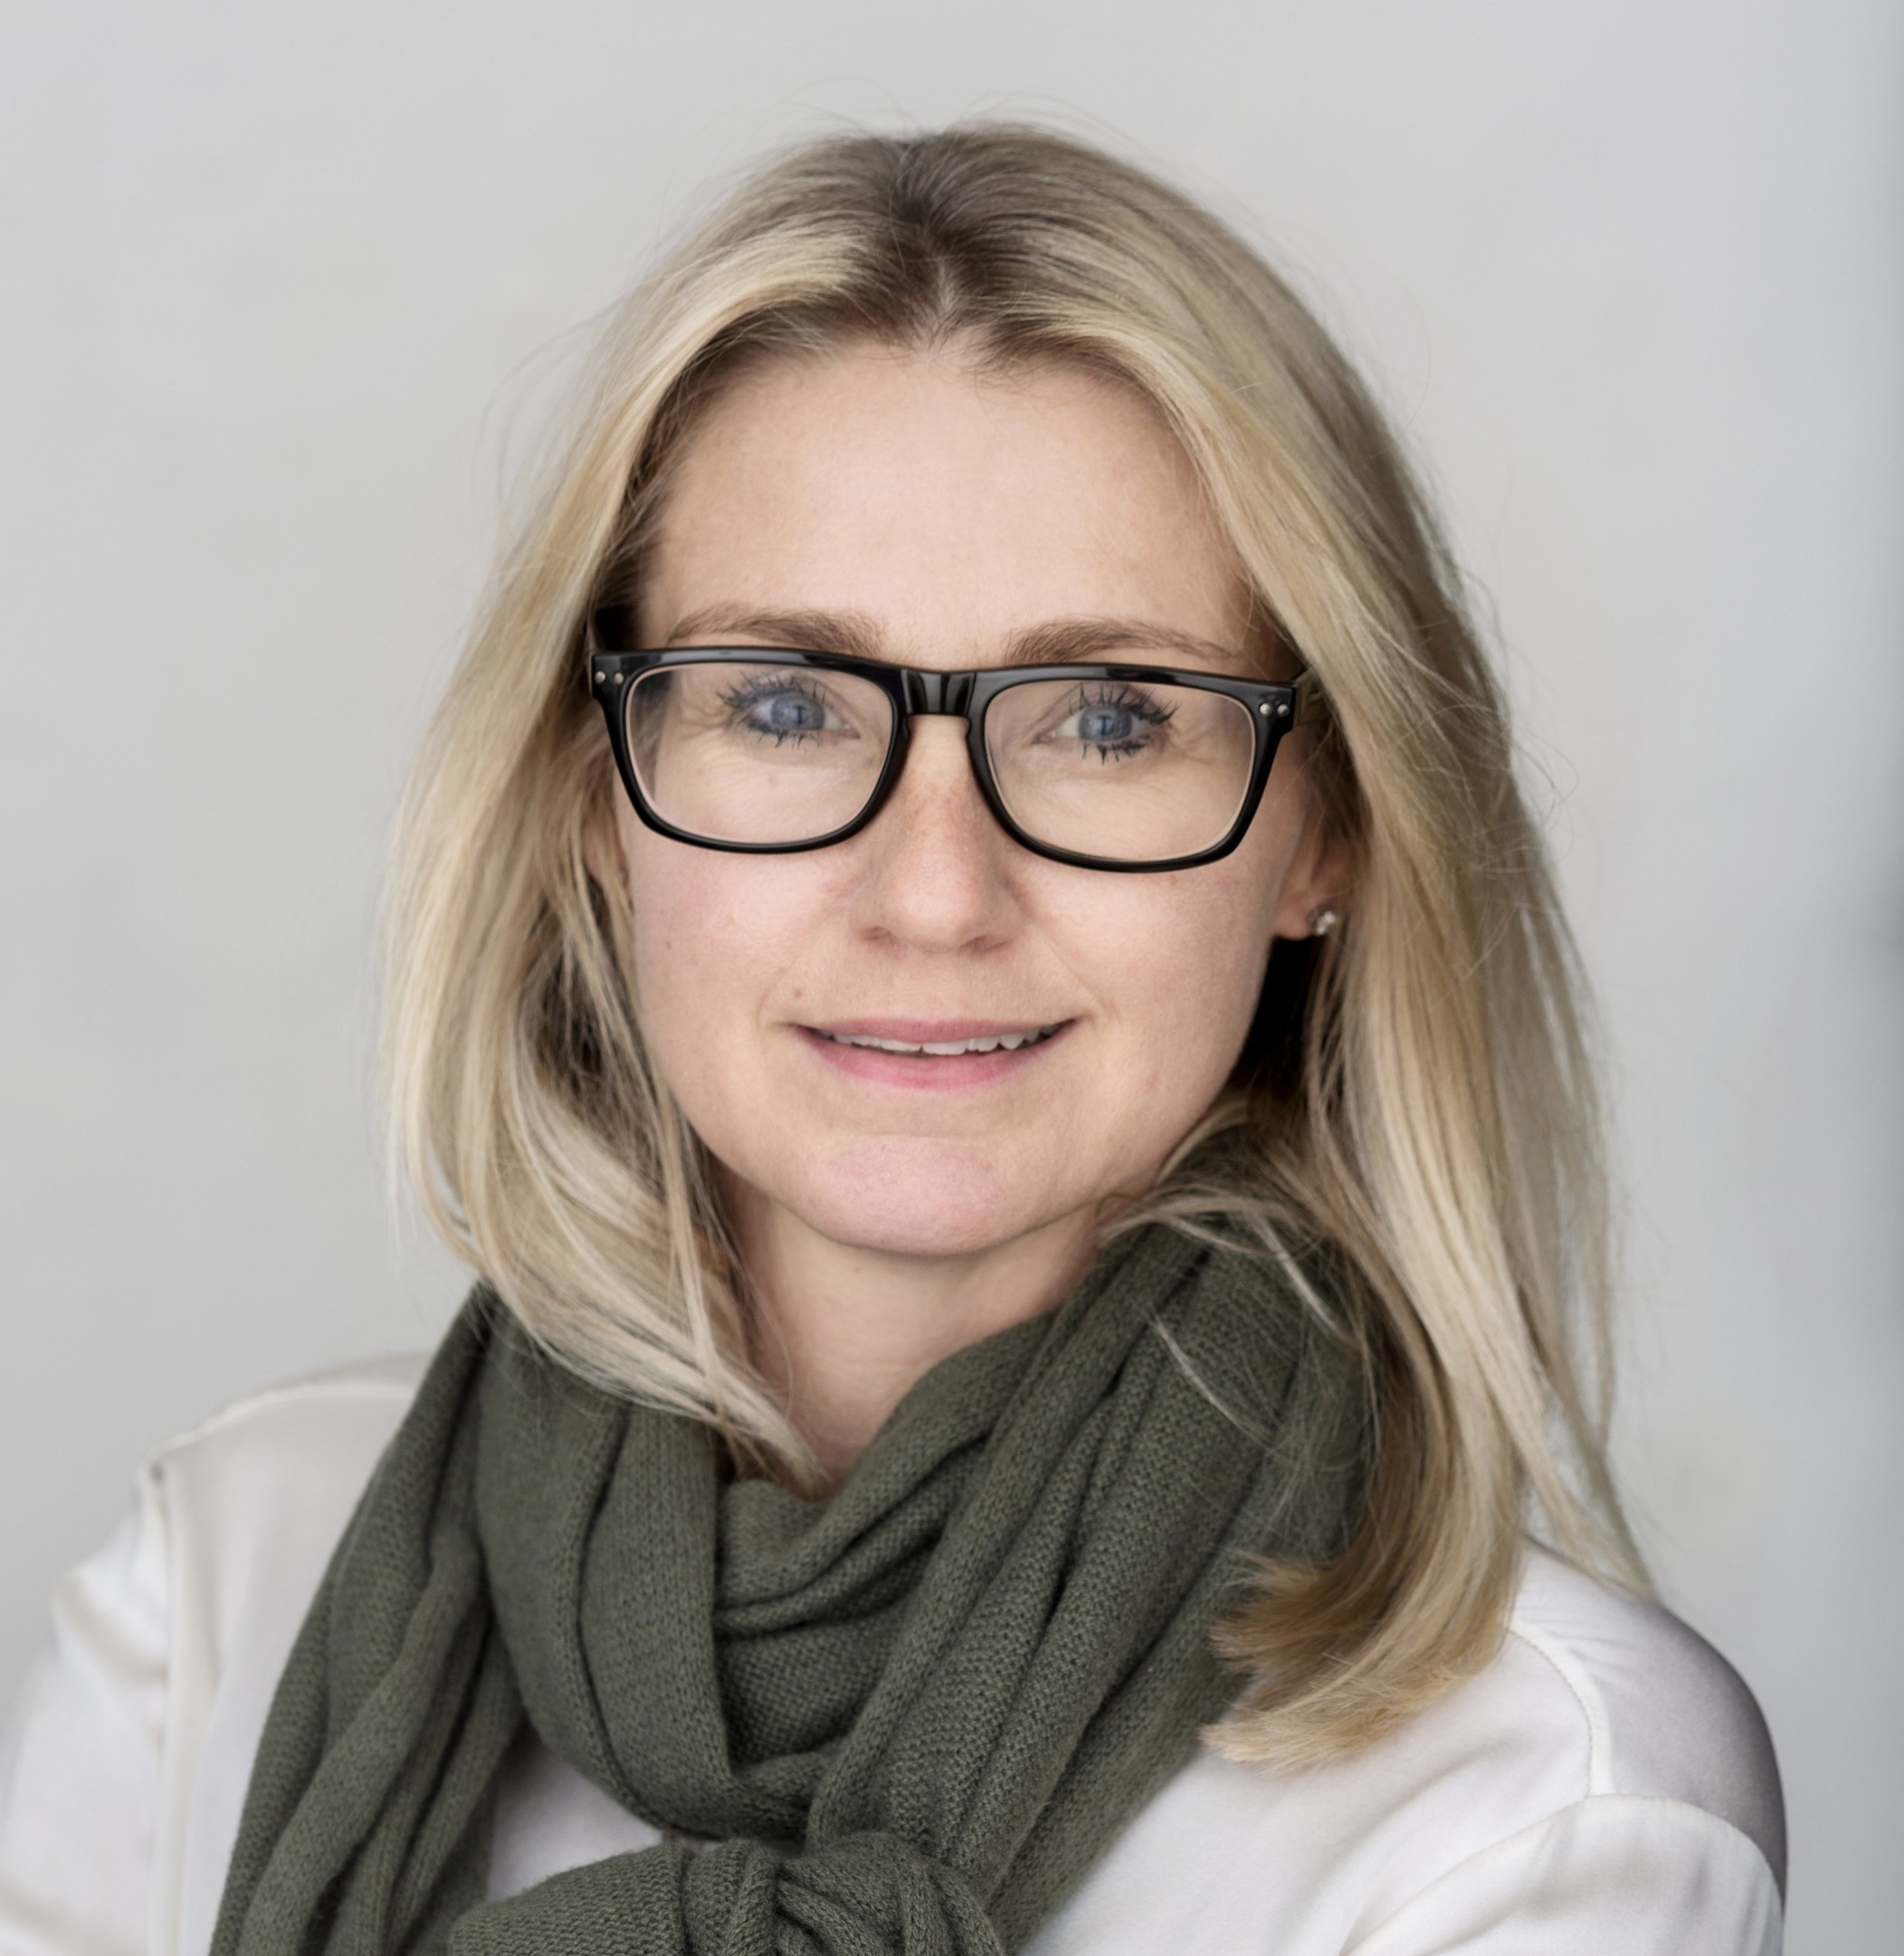 Jessica Bjurström